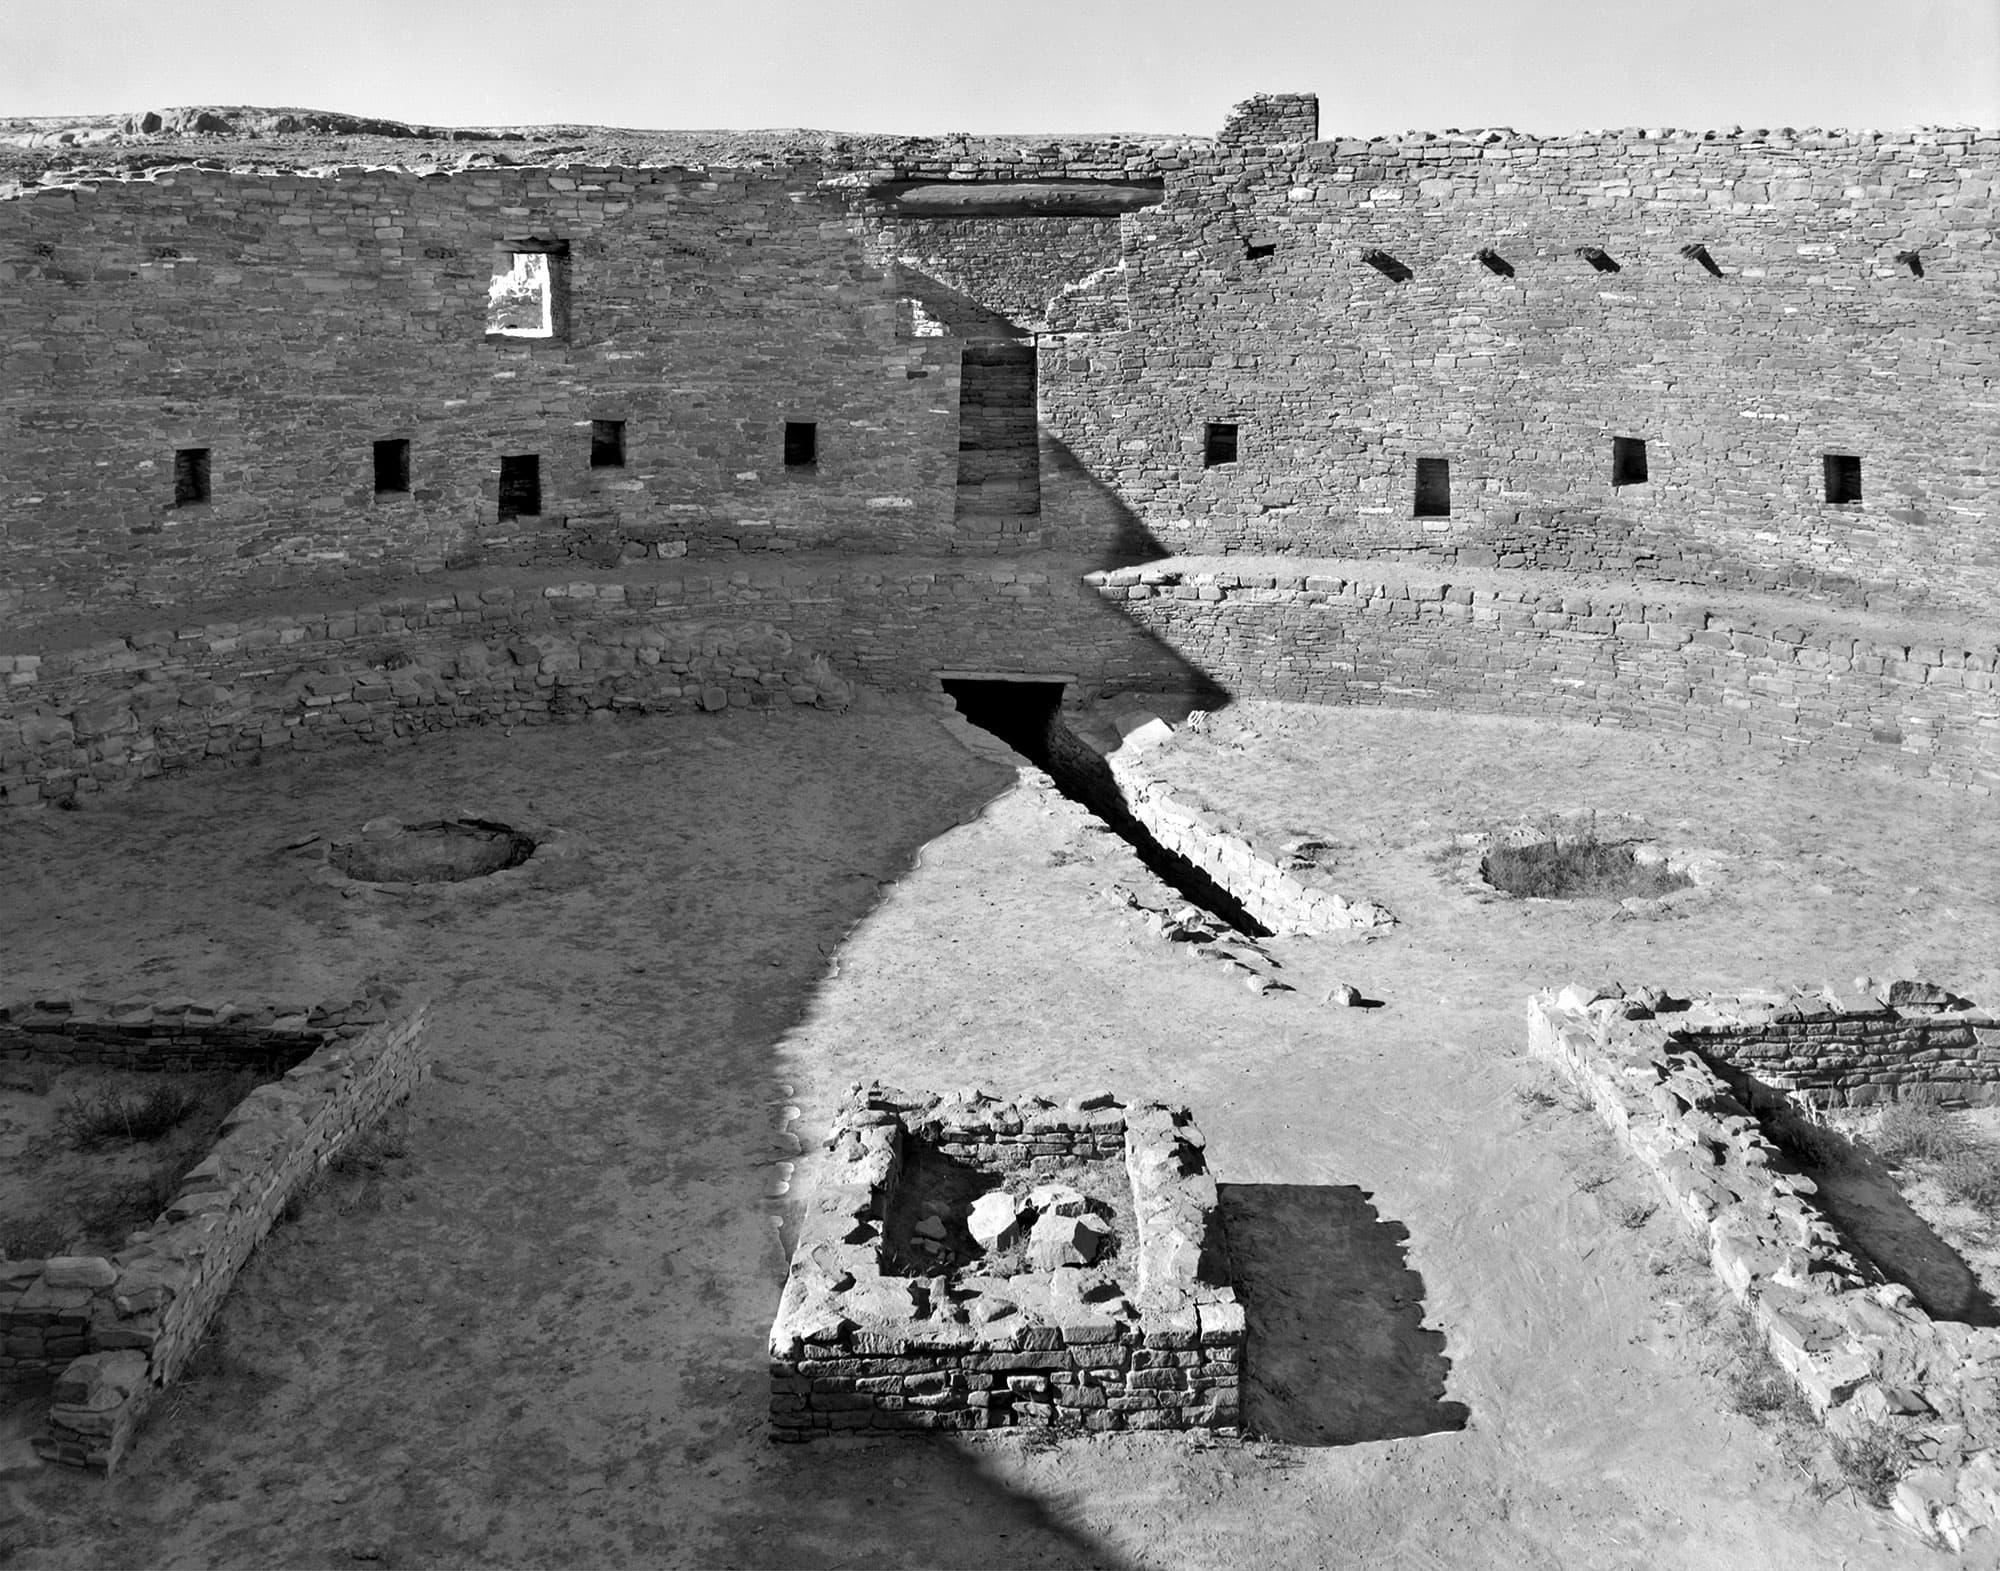 arthur-lazar-Rinconada-Chaco-NM-1989